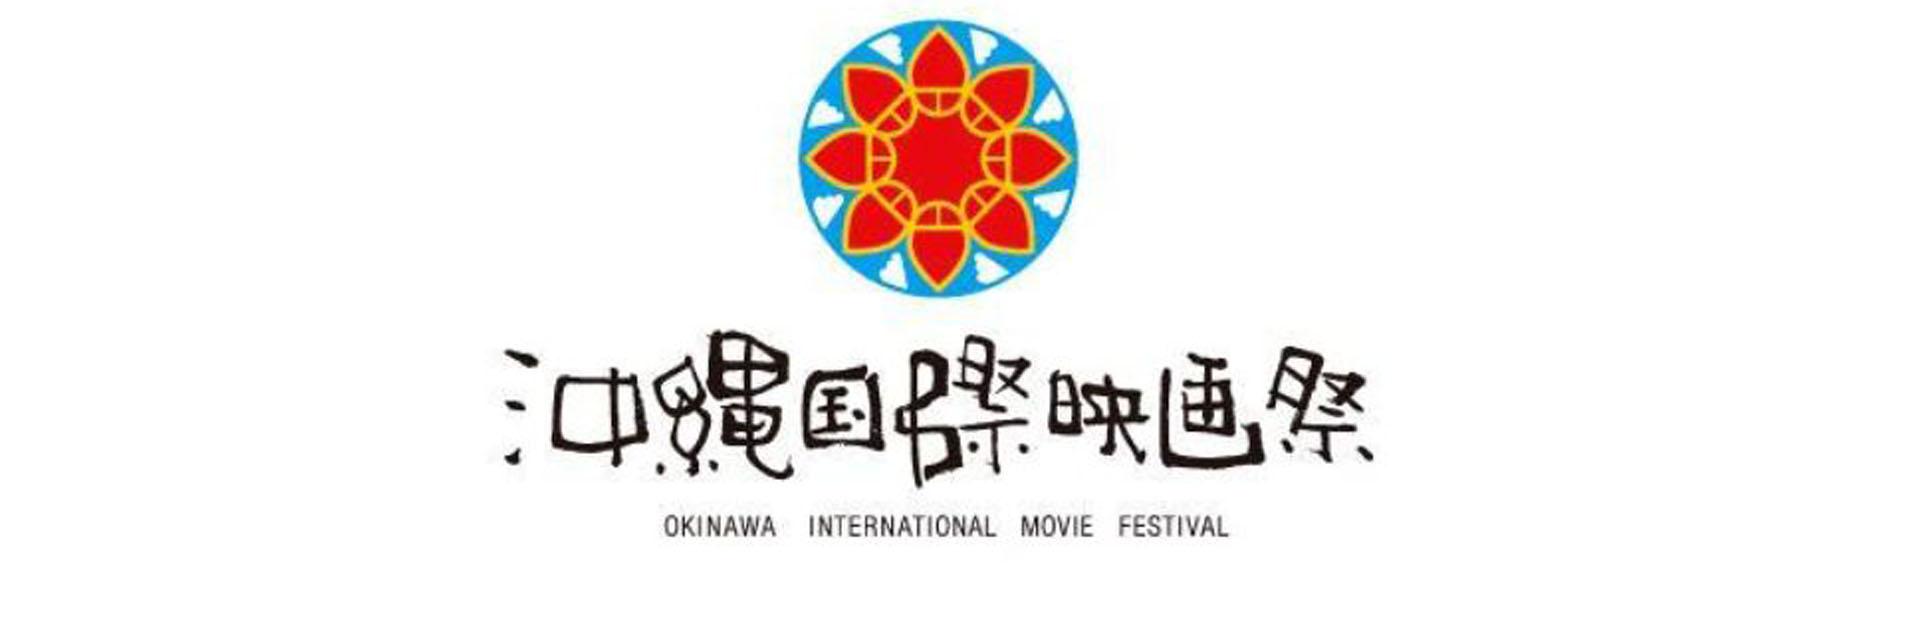 Okinawa Film Festival 2014